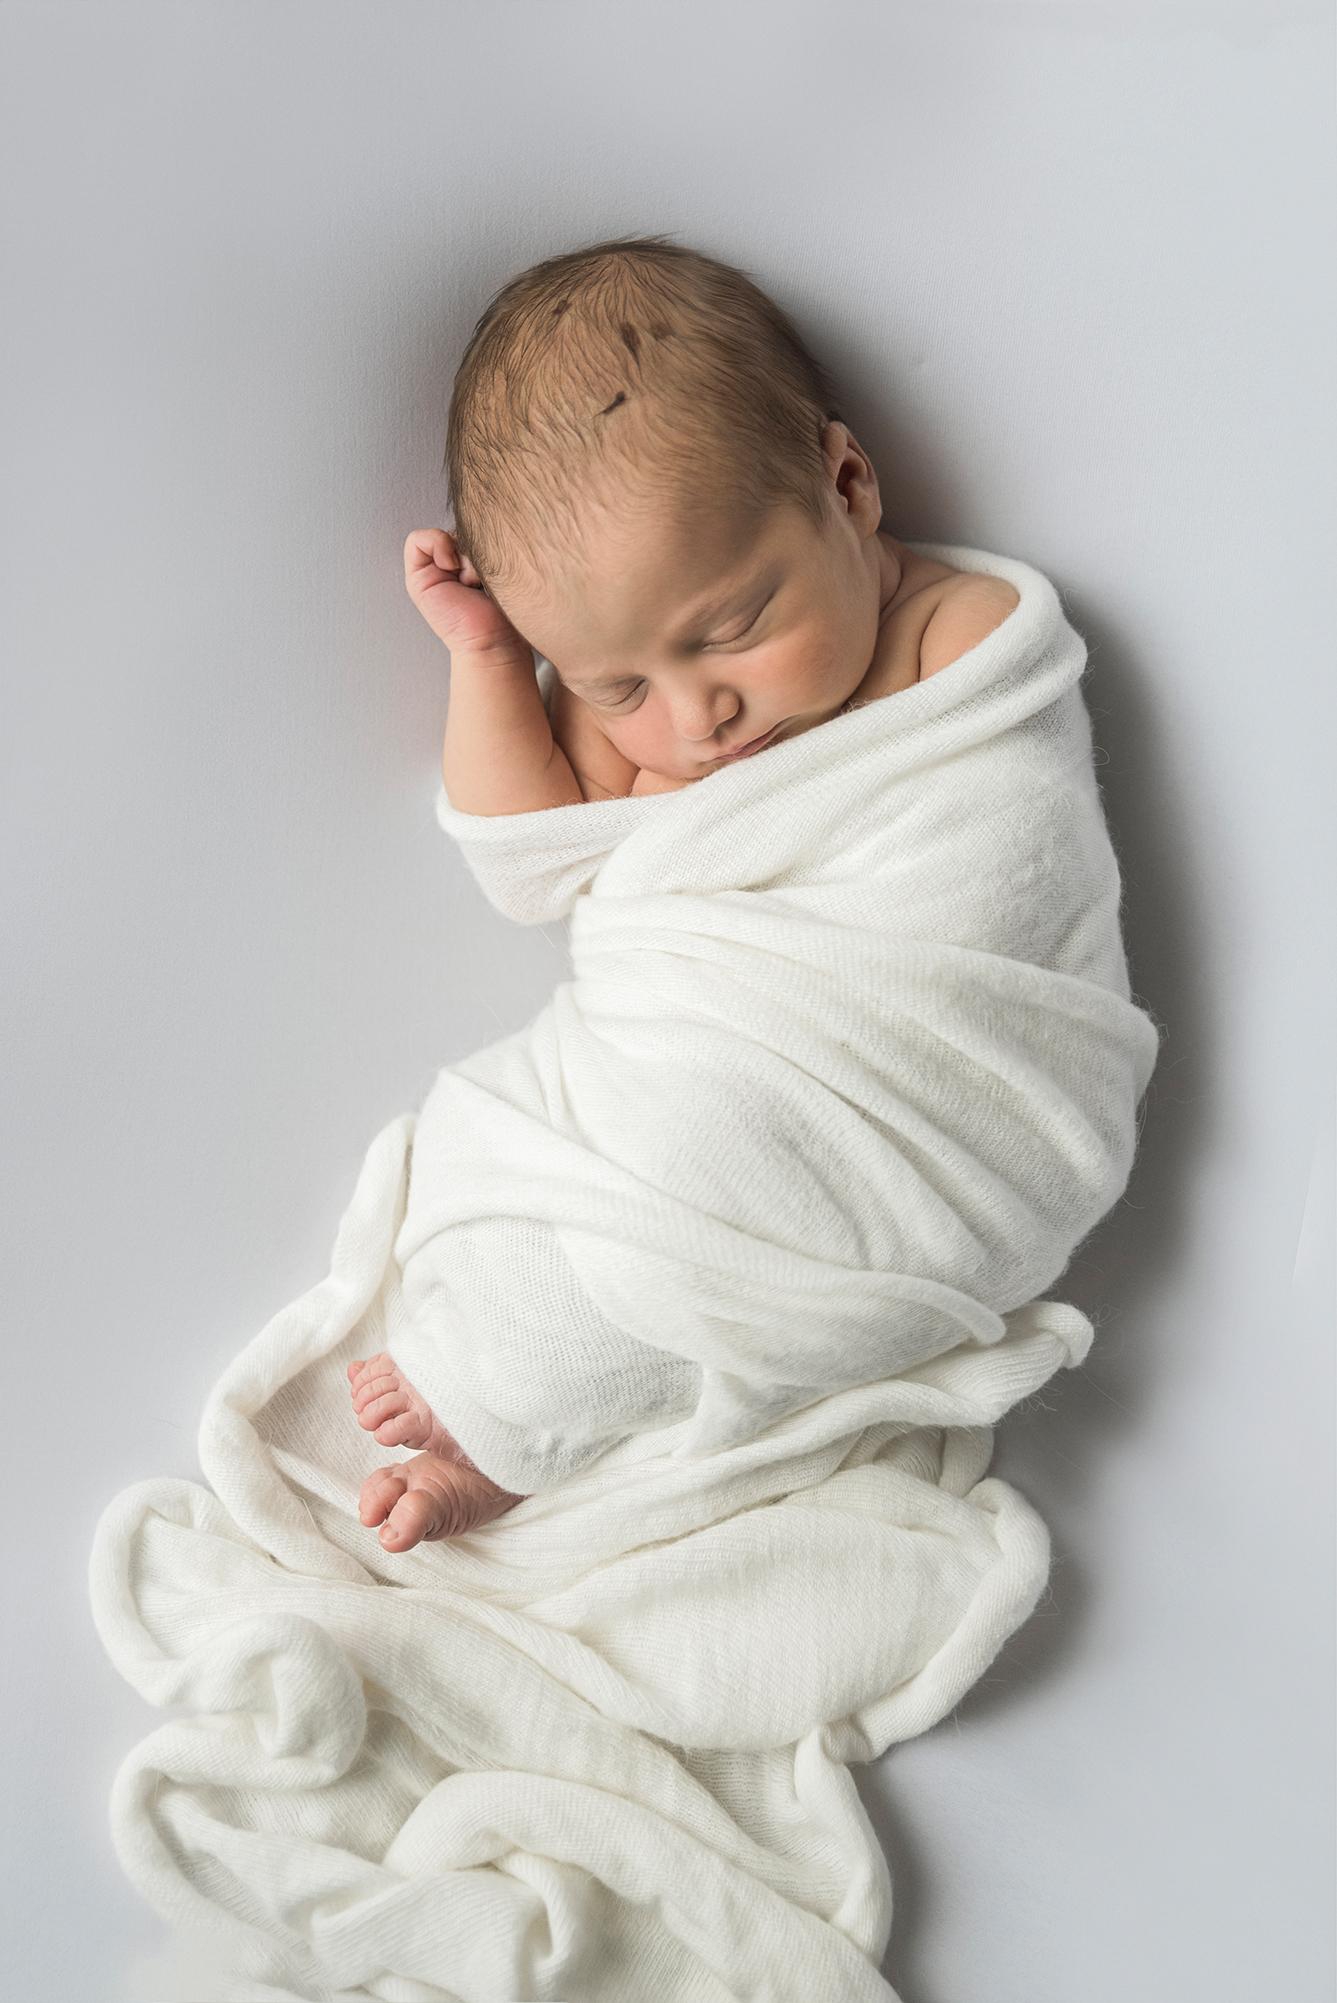 oakley newborn5 fx.jpg